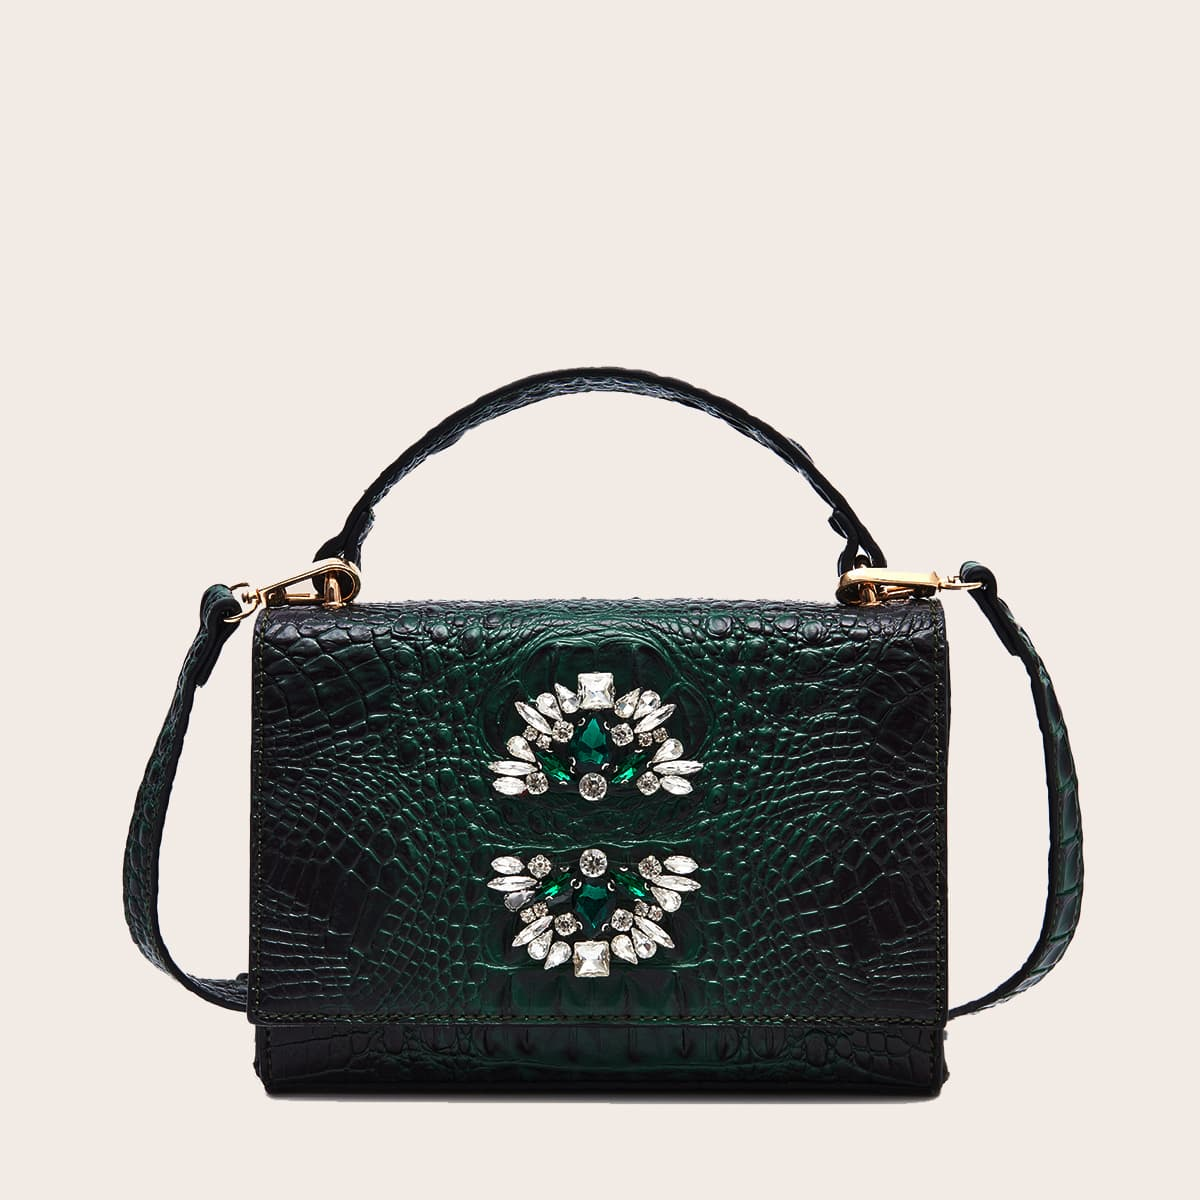 Gemstone Decor Croc Embossed Flap Satchel Bag, SHEIN  - buy with discount